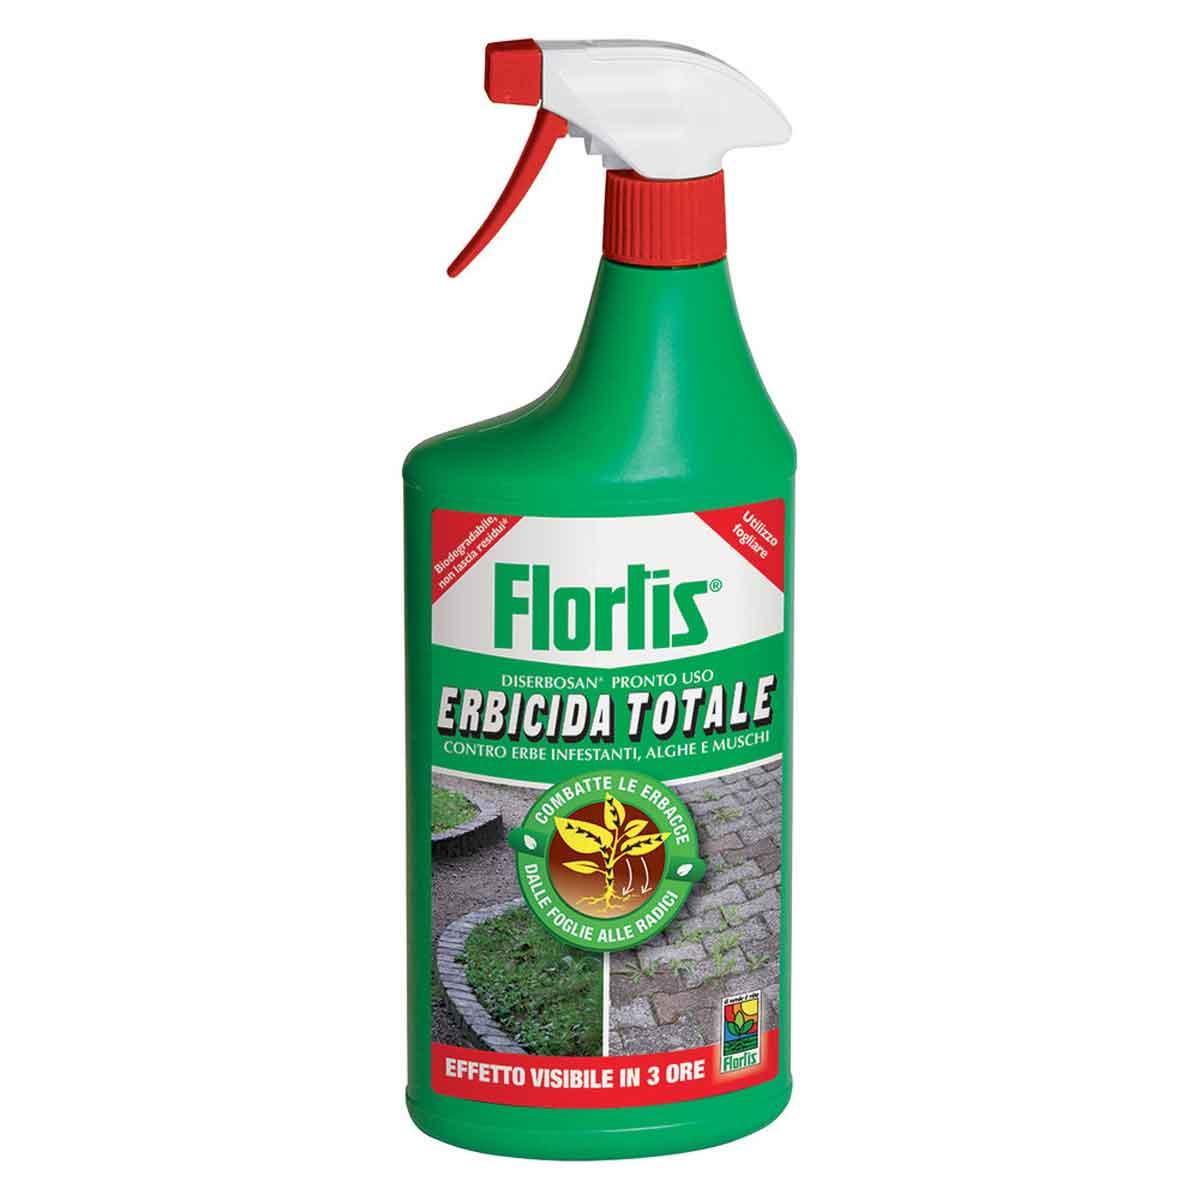 Flortis Diserbosan Erbicida totale pronto all'uso